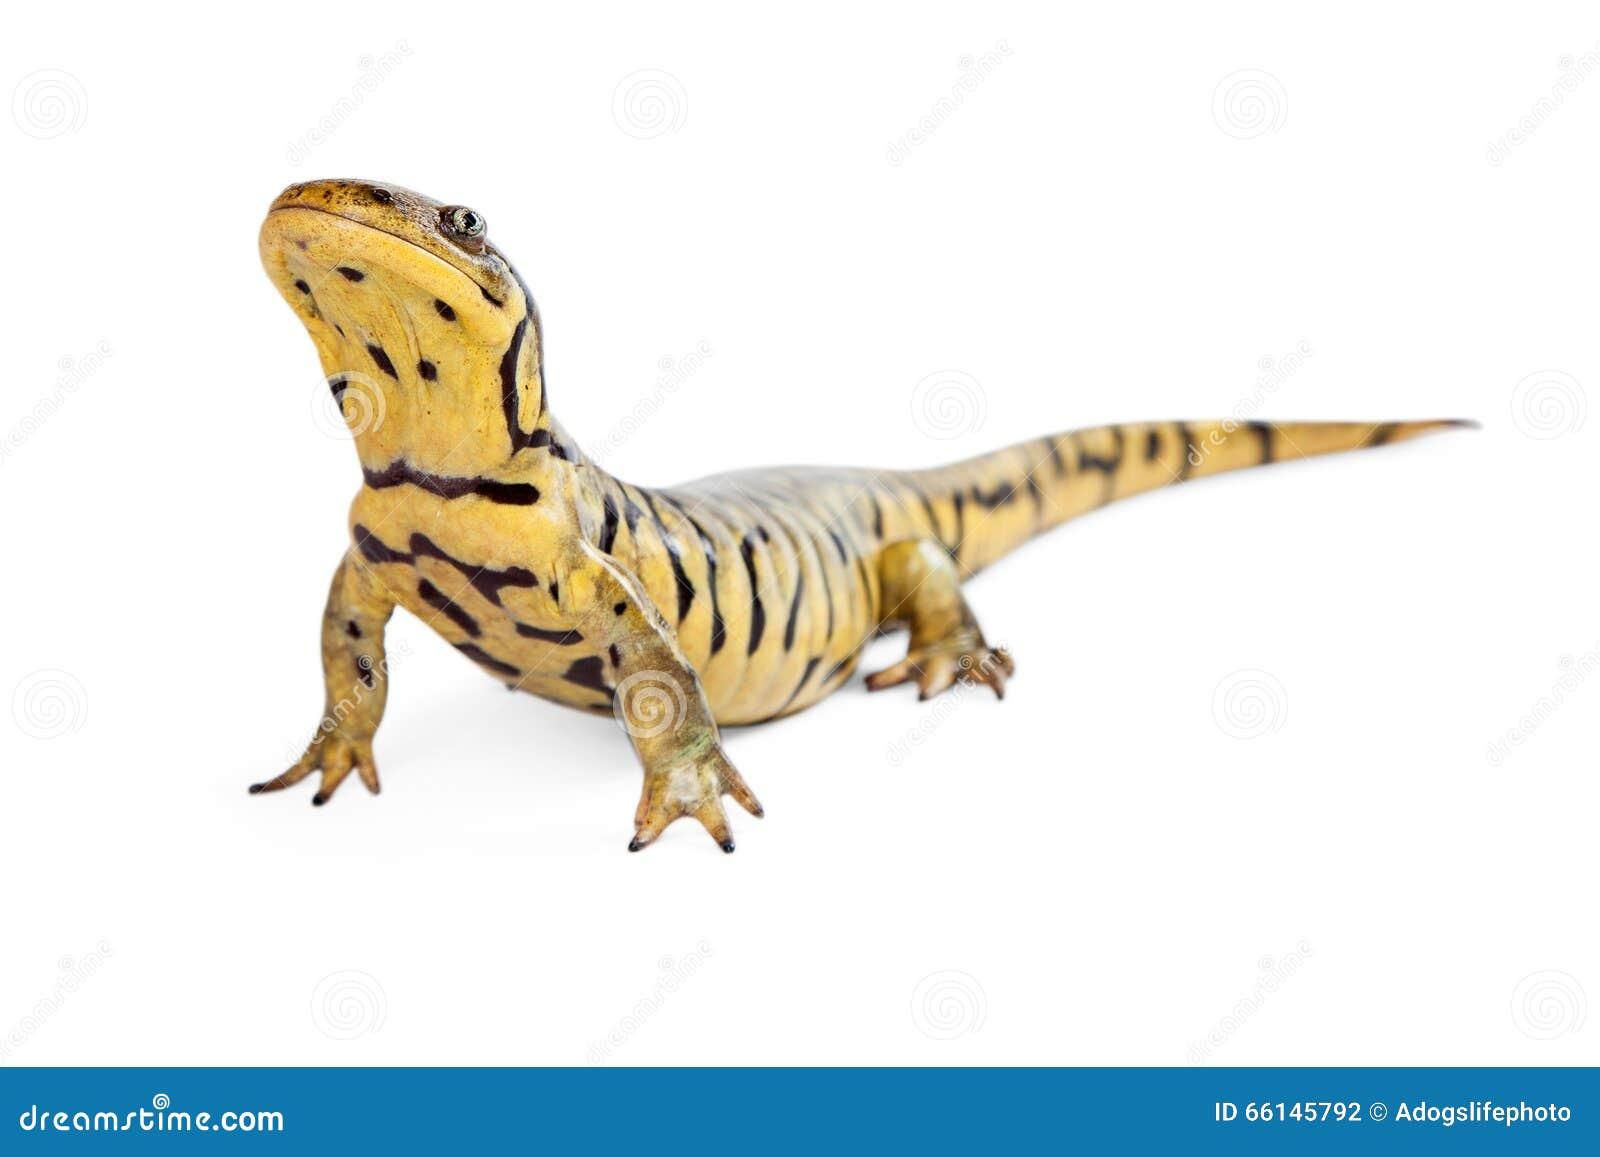 salamander white background - photo #28